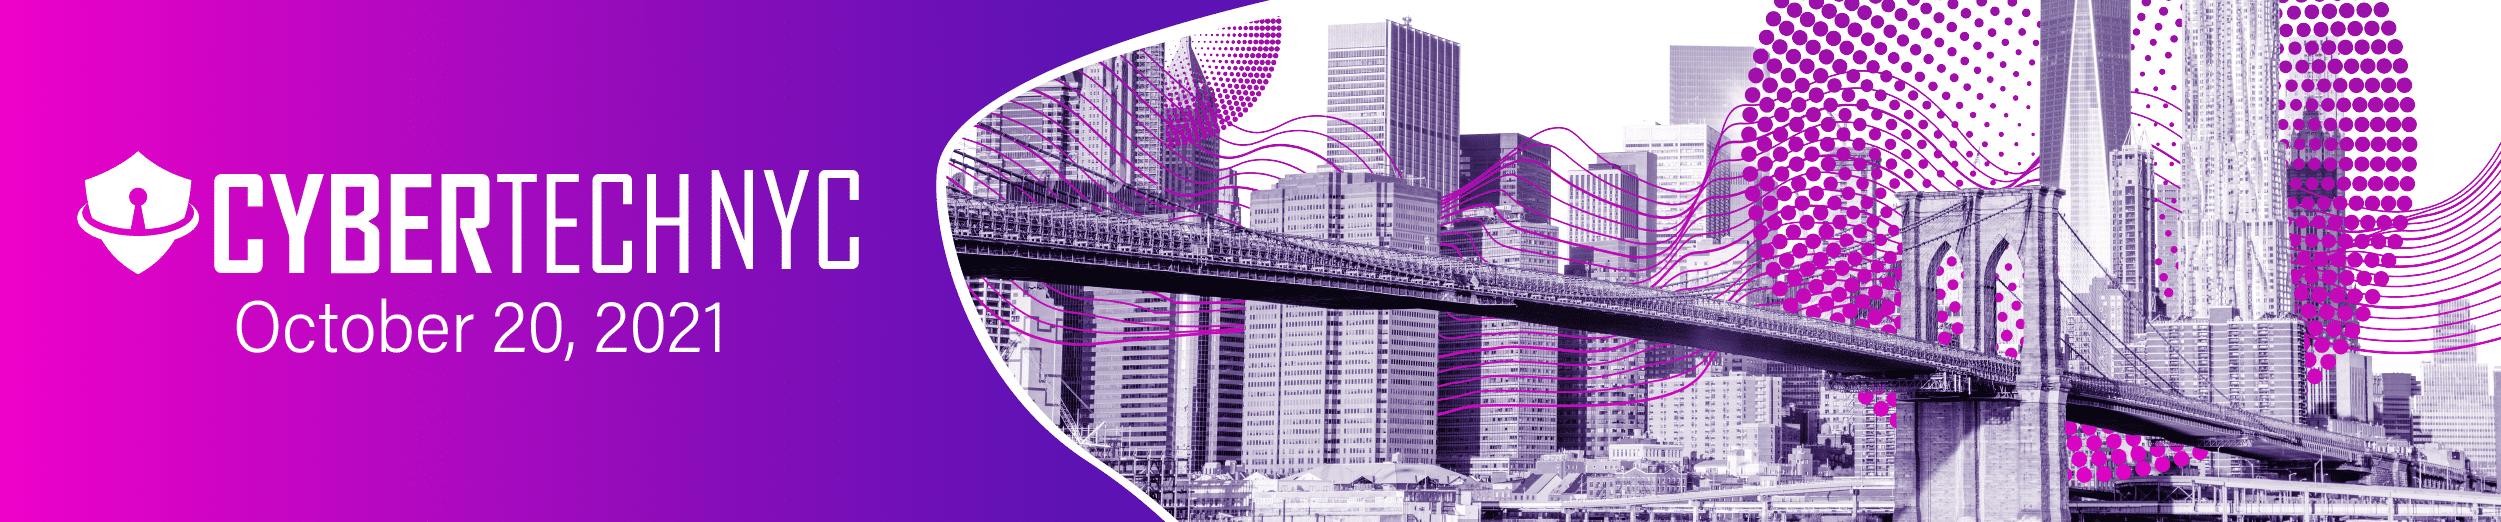 Cybertech NYC 2021